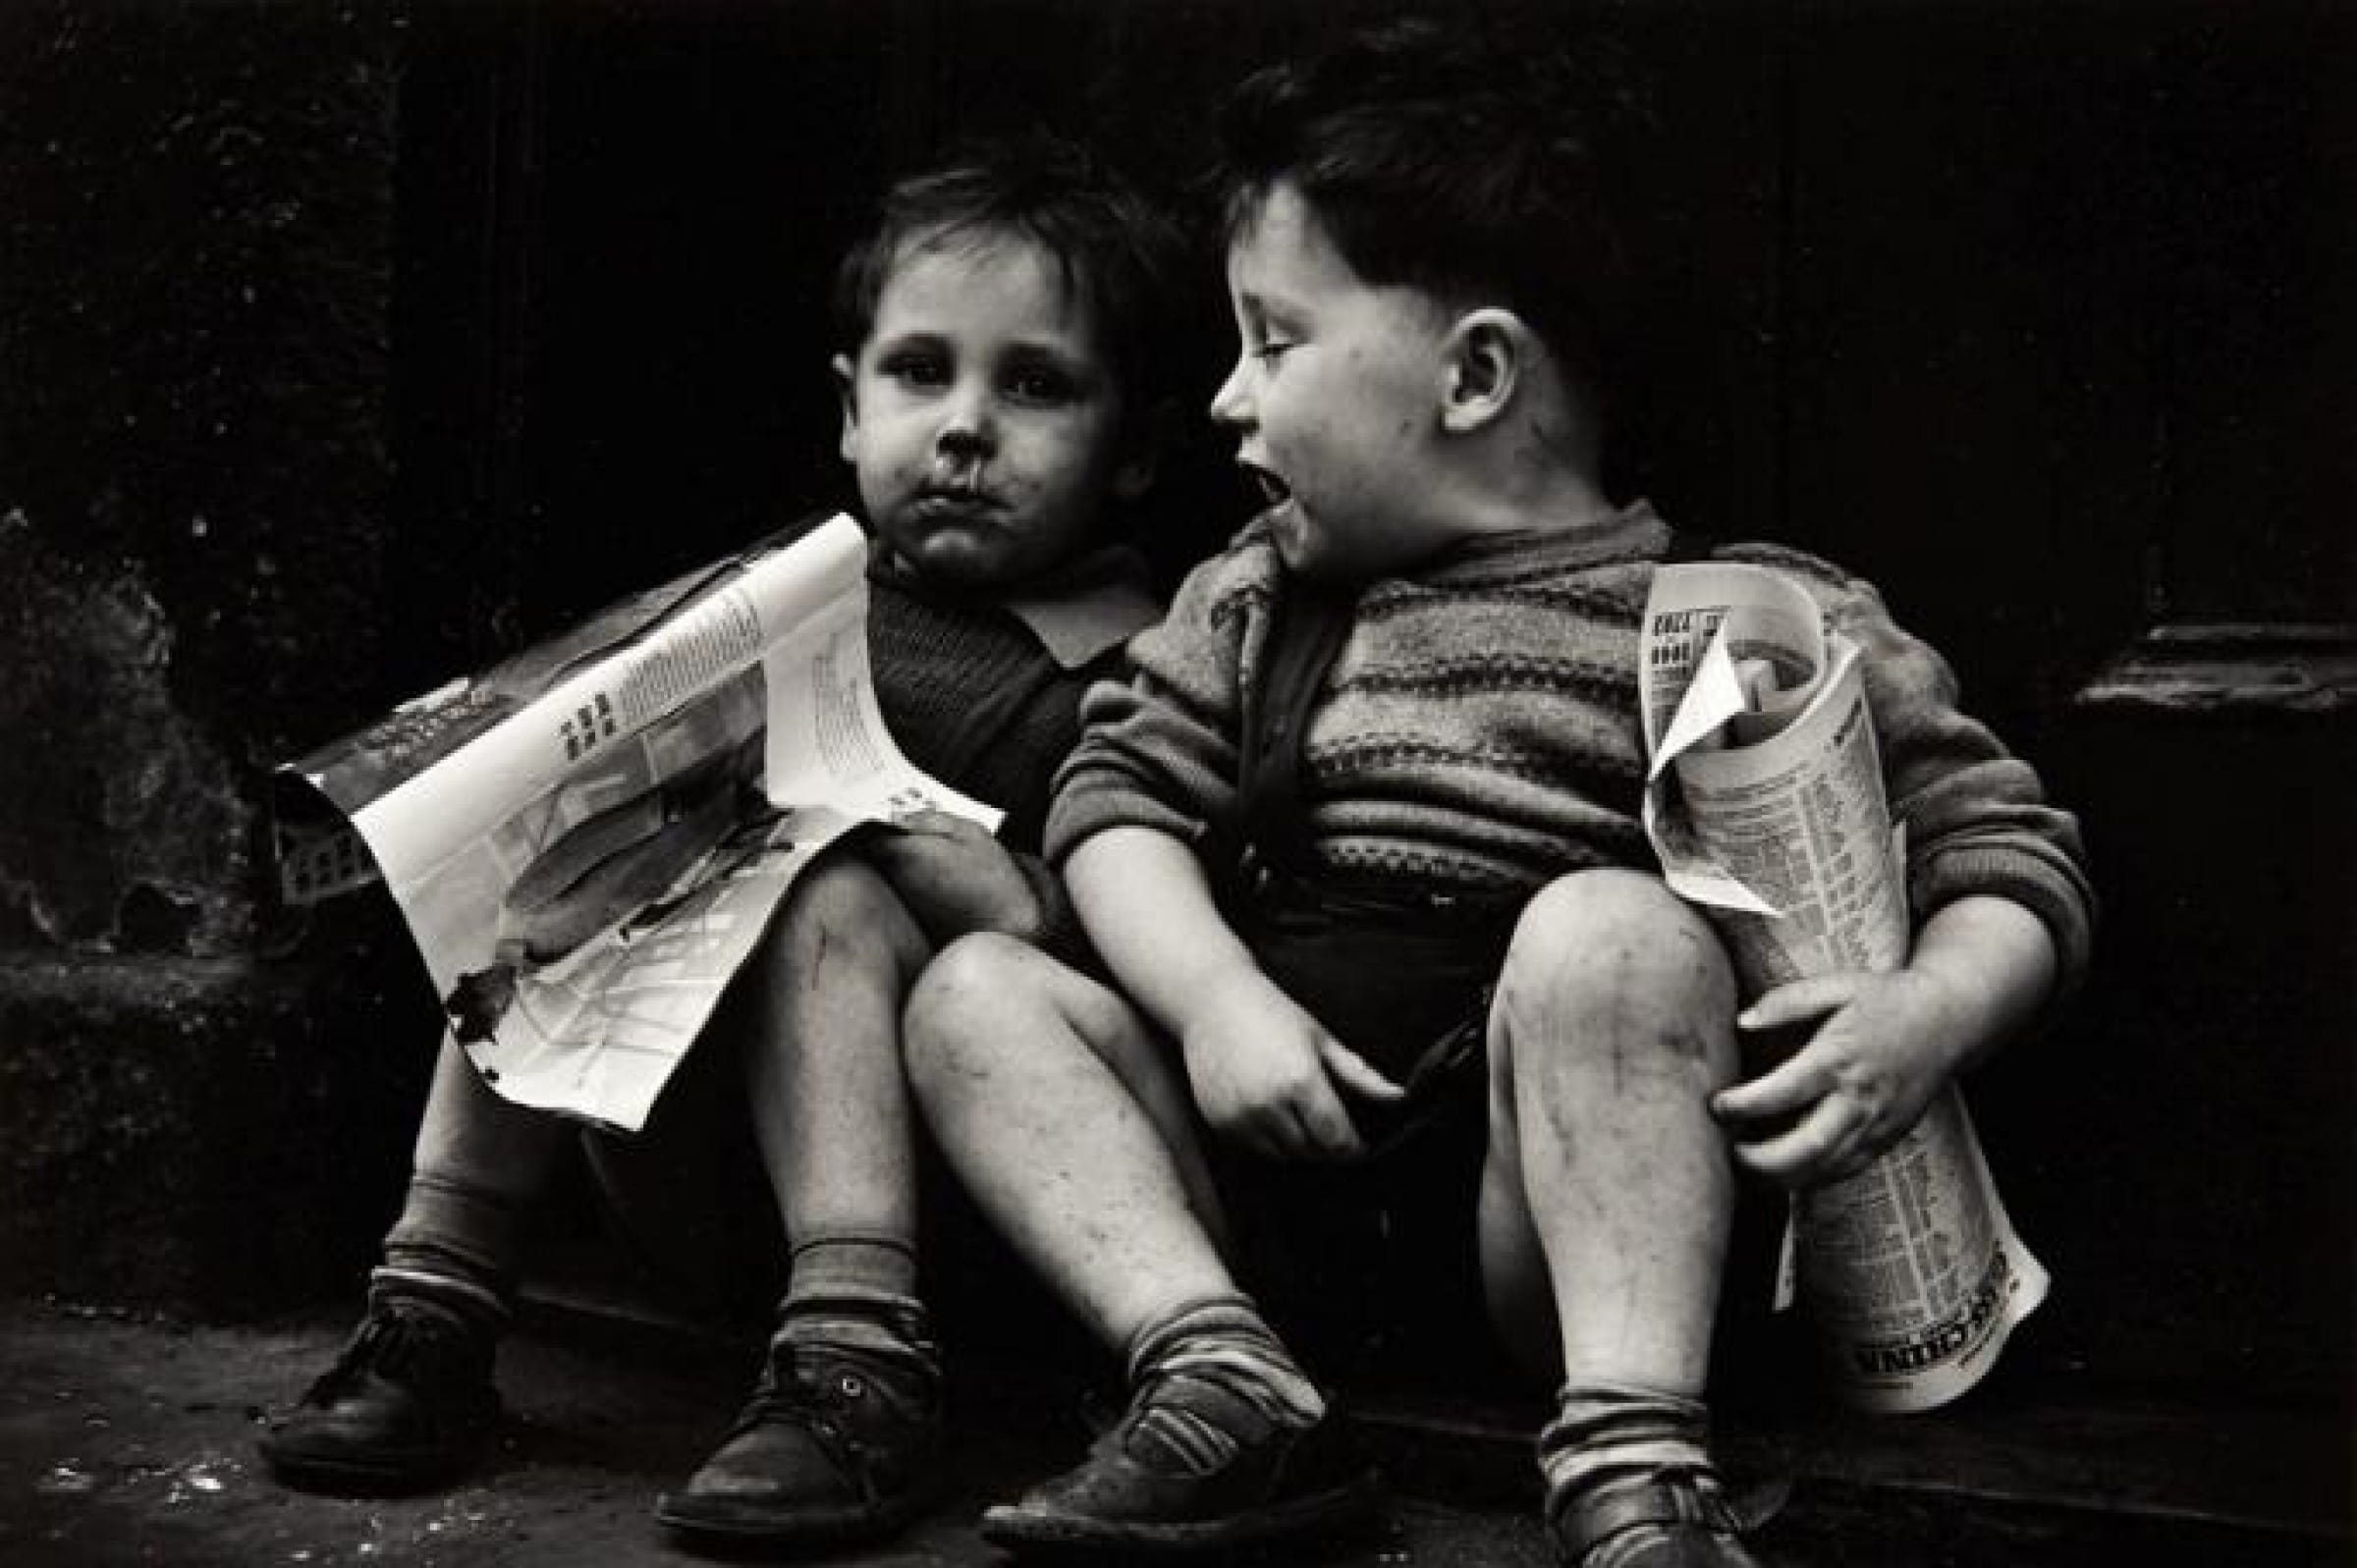 Read all about it! (Gorbals boys, 1960s, Joseph McKenzie)